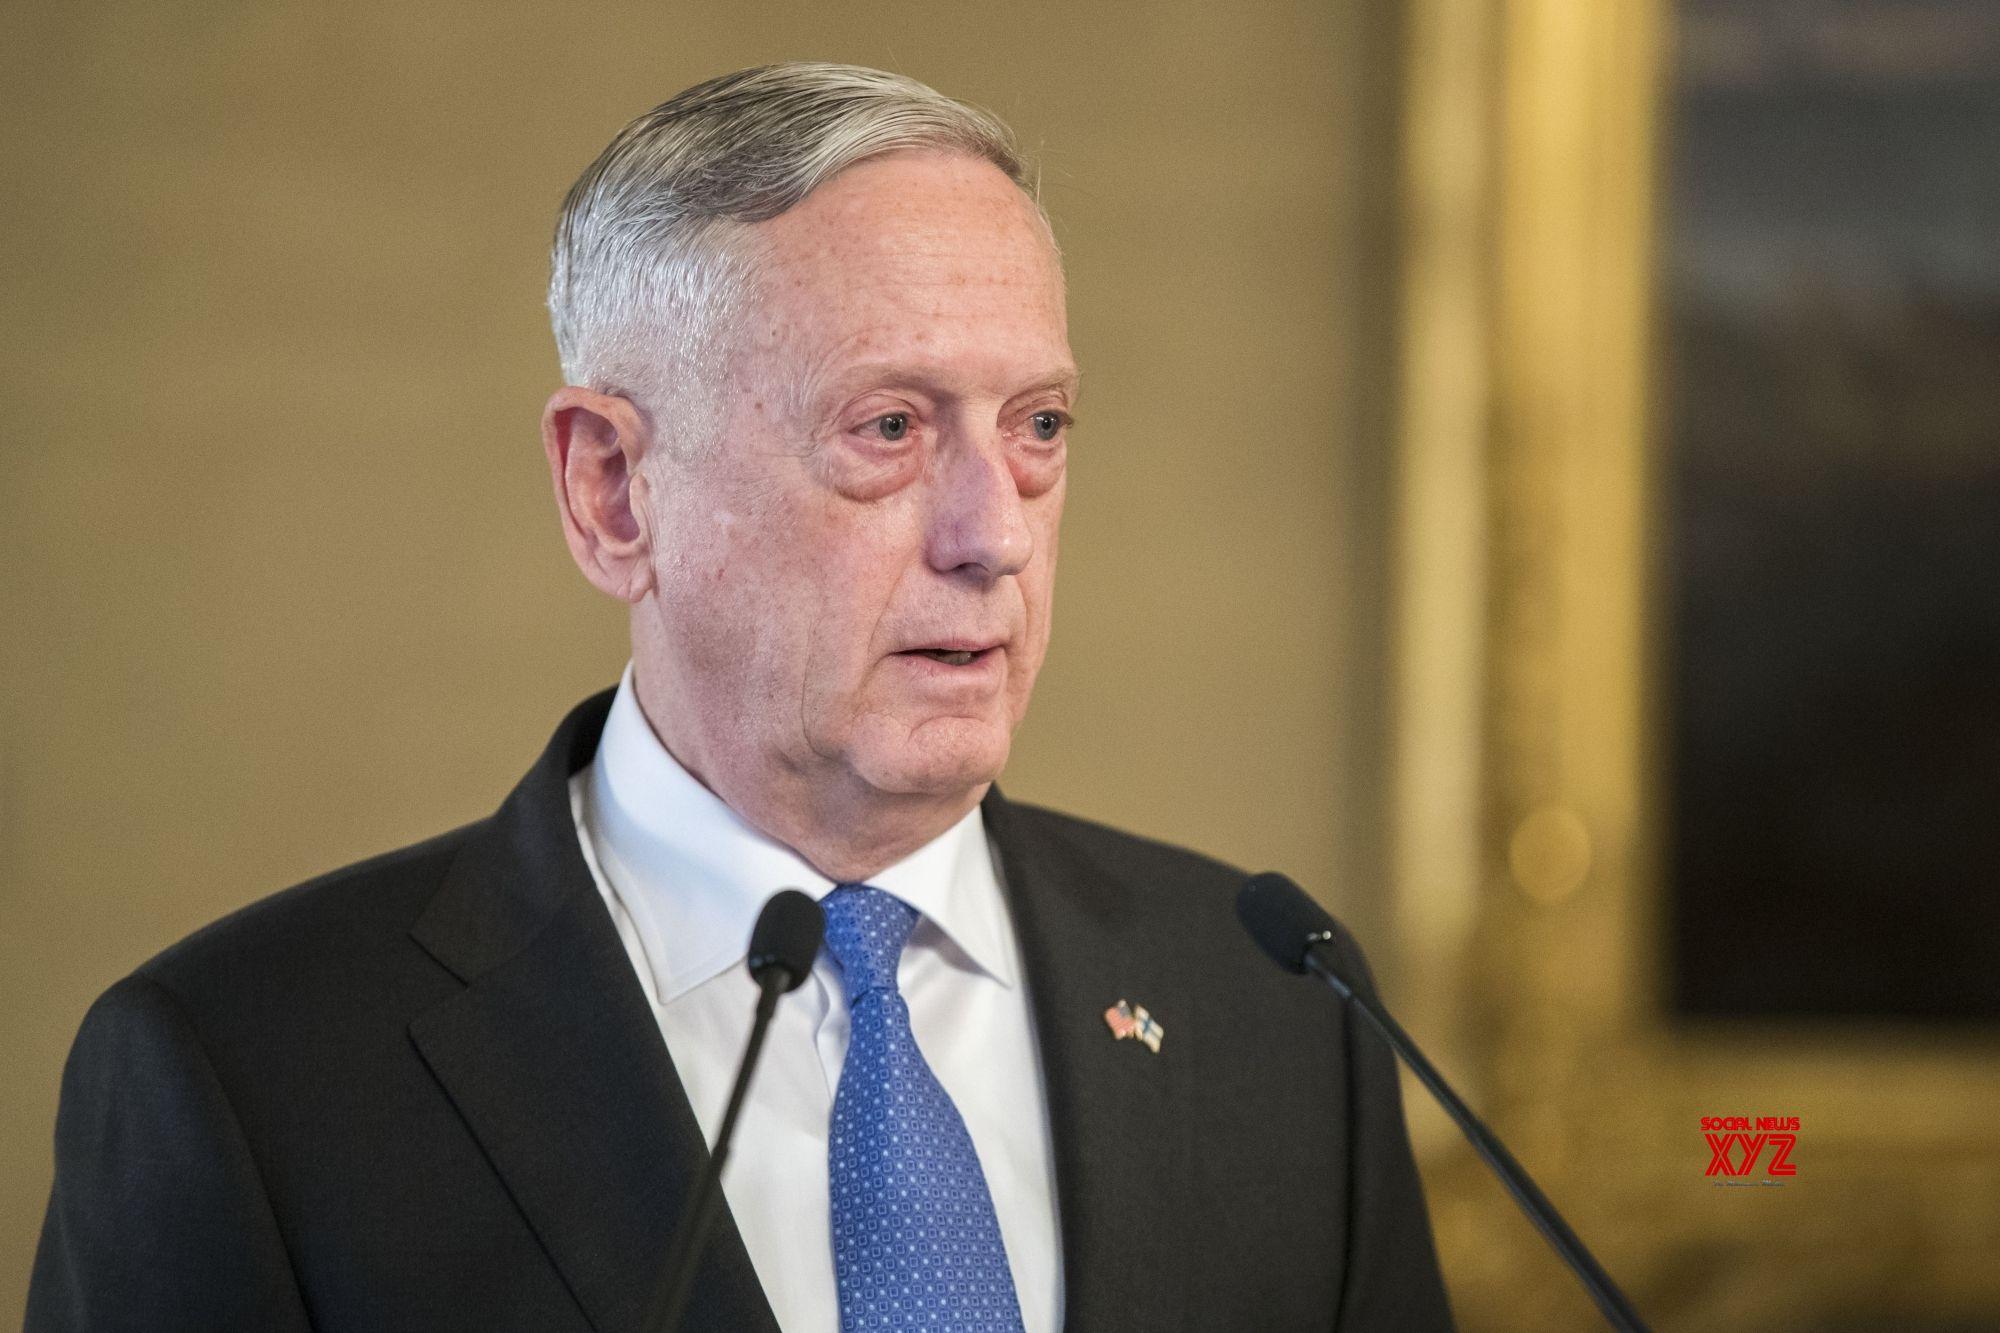 Mattis resignation letter lays out challenges for successor